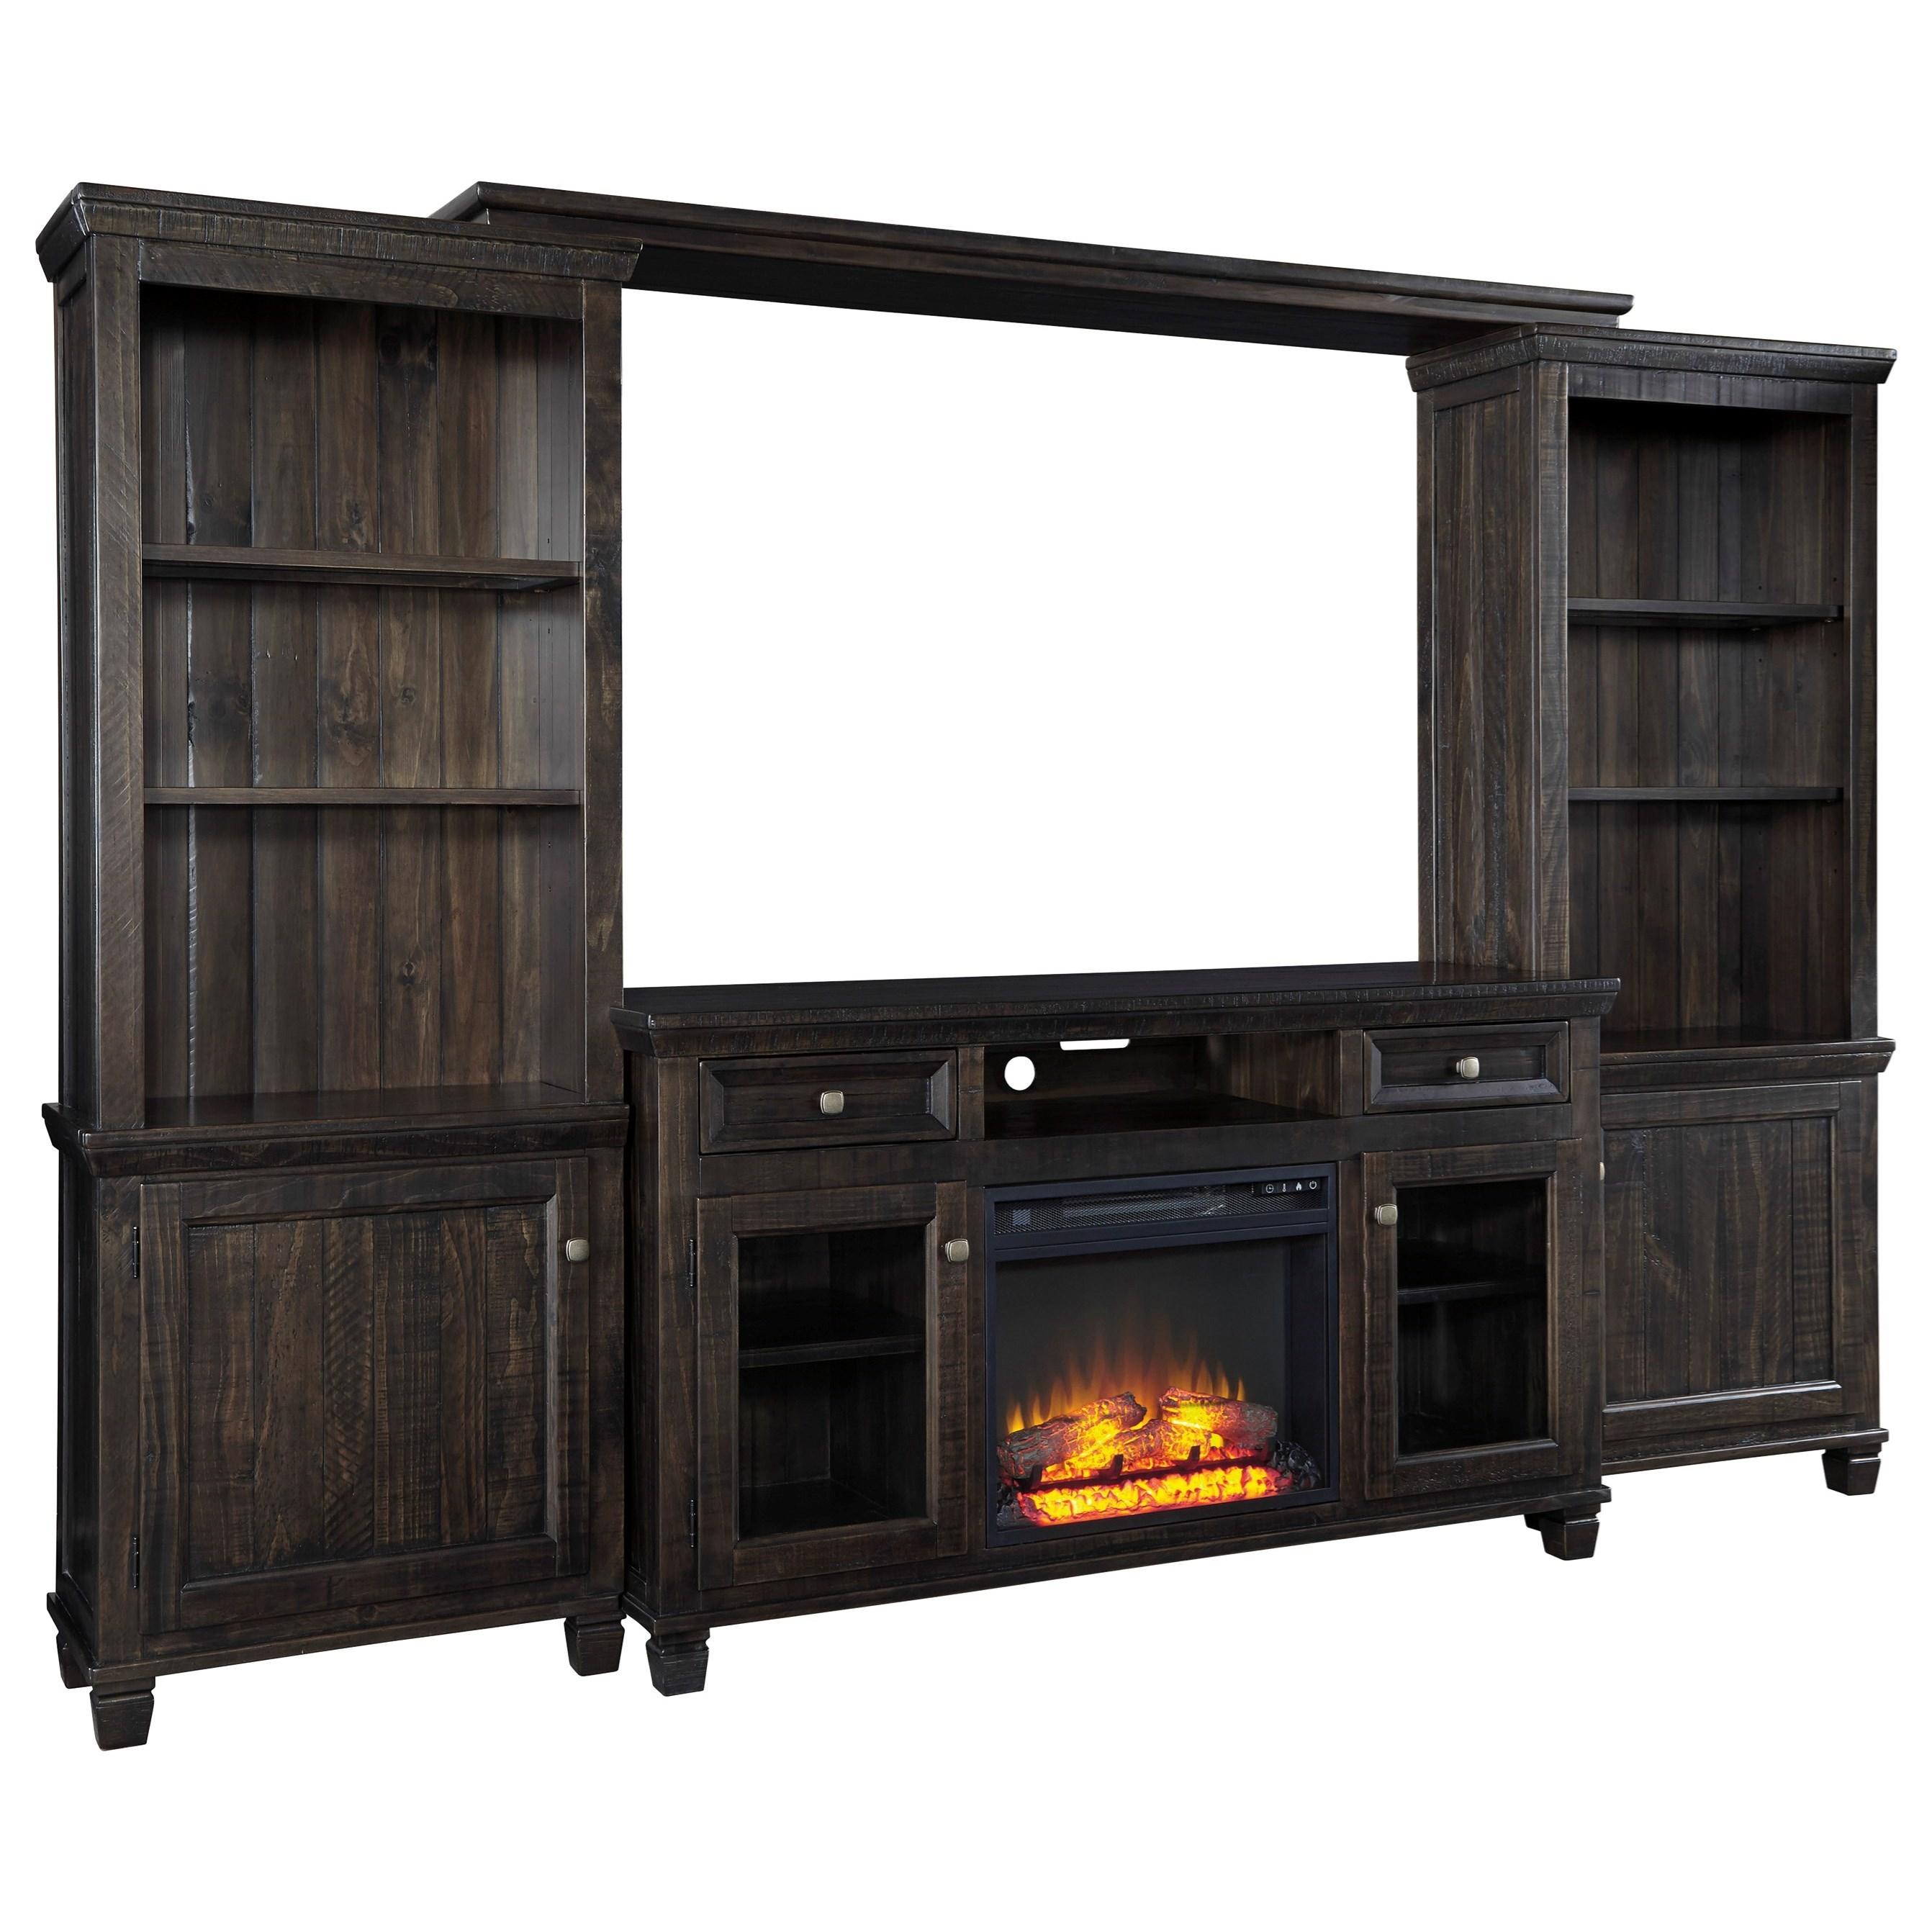 Entertainment Center w/ Fireplace